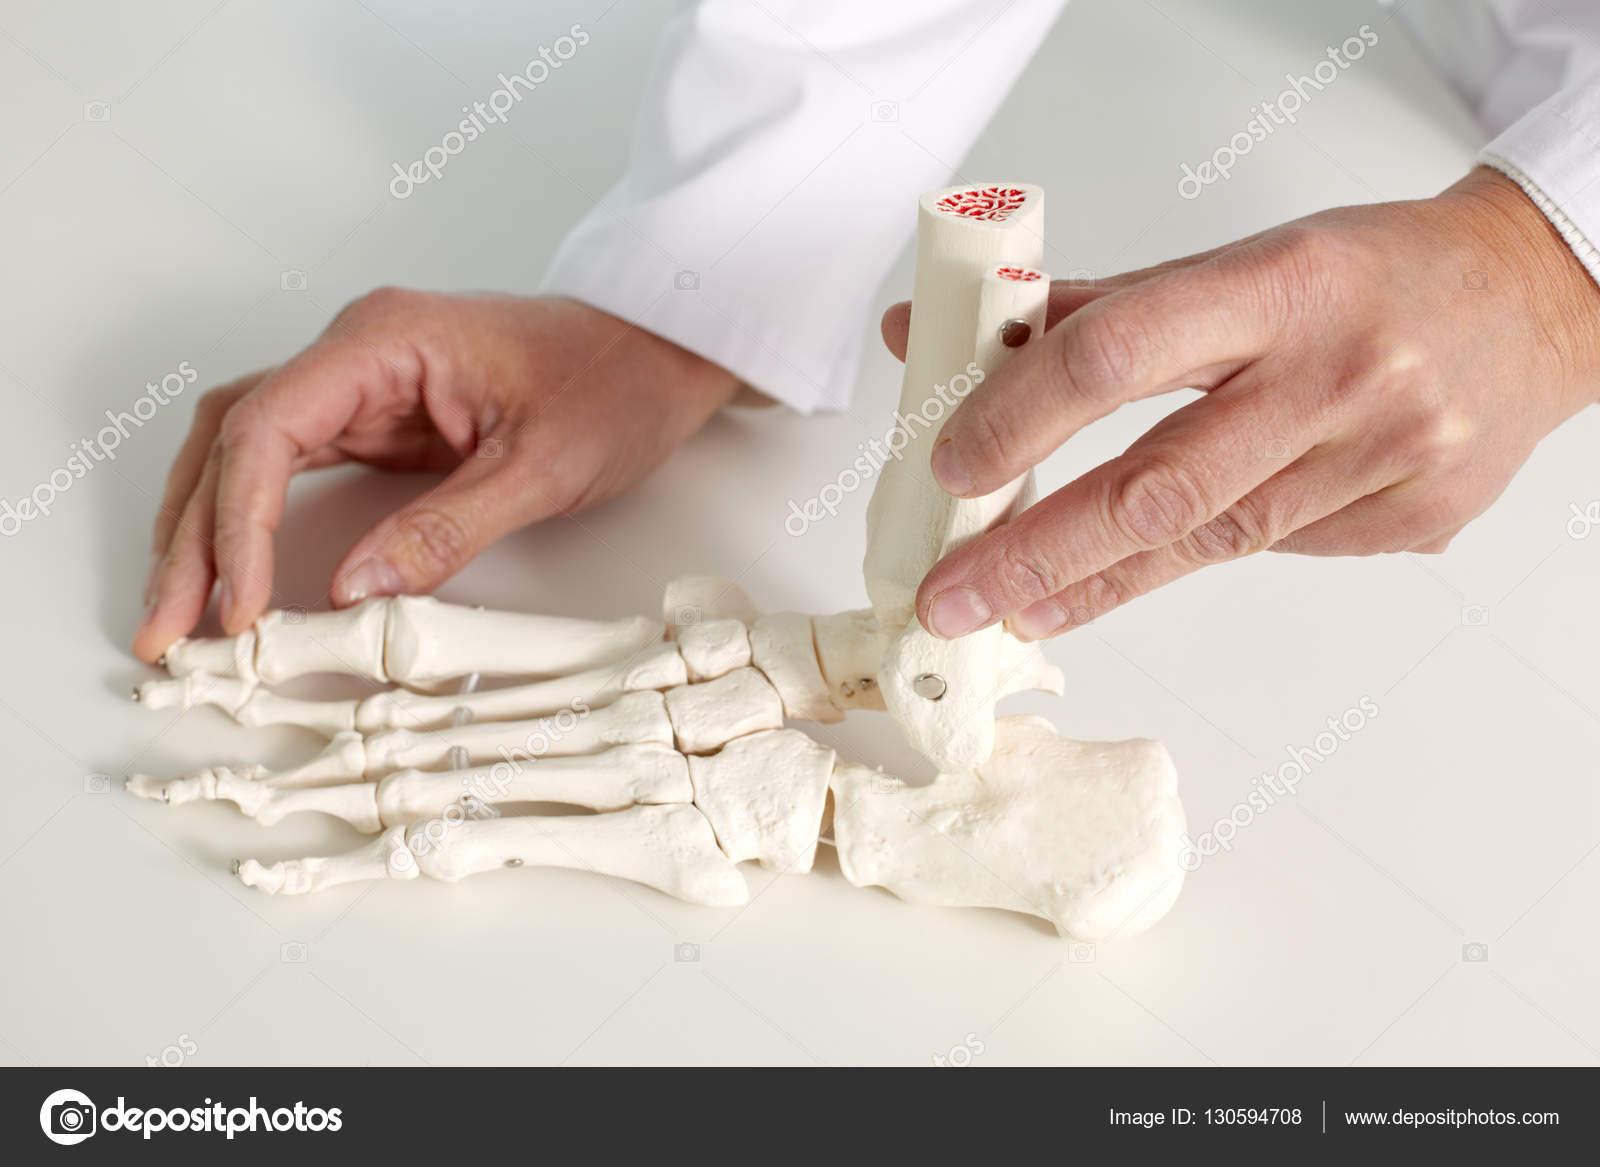 modelo de huesos del pie — Foto de stock © pressmaster #130594708